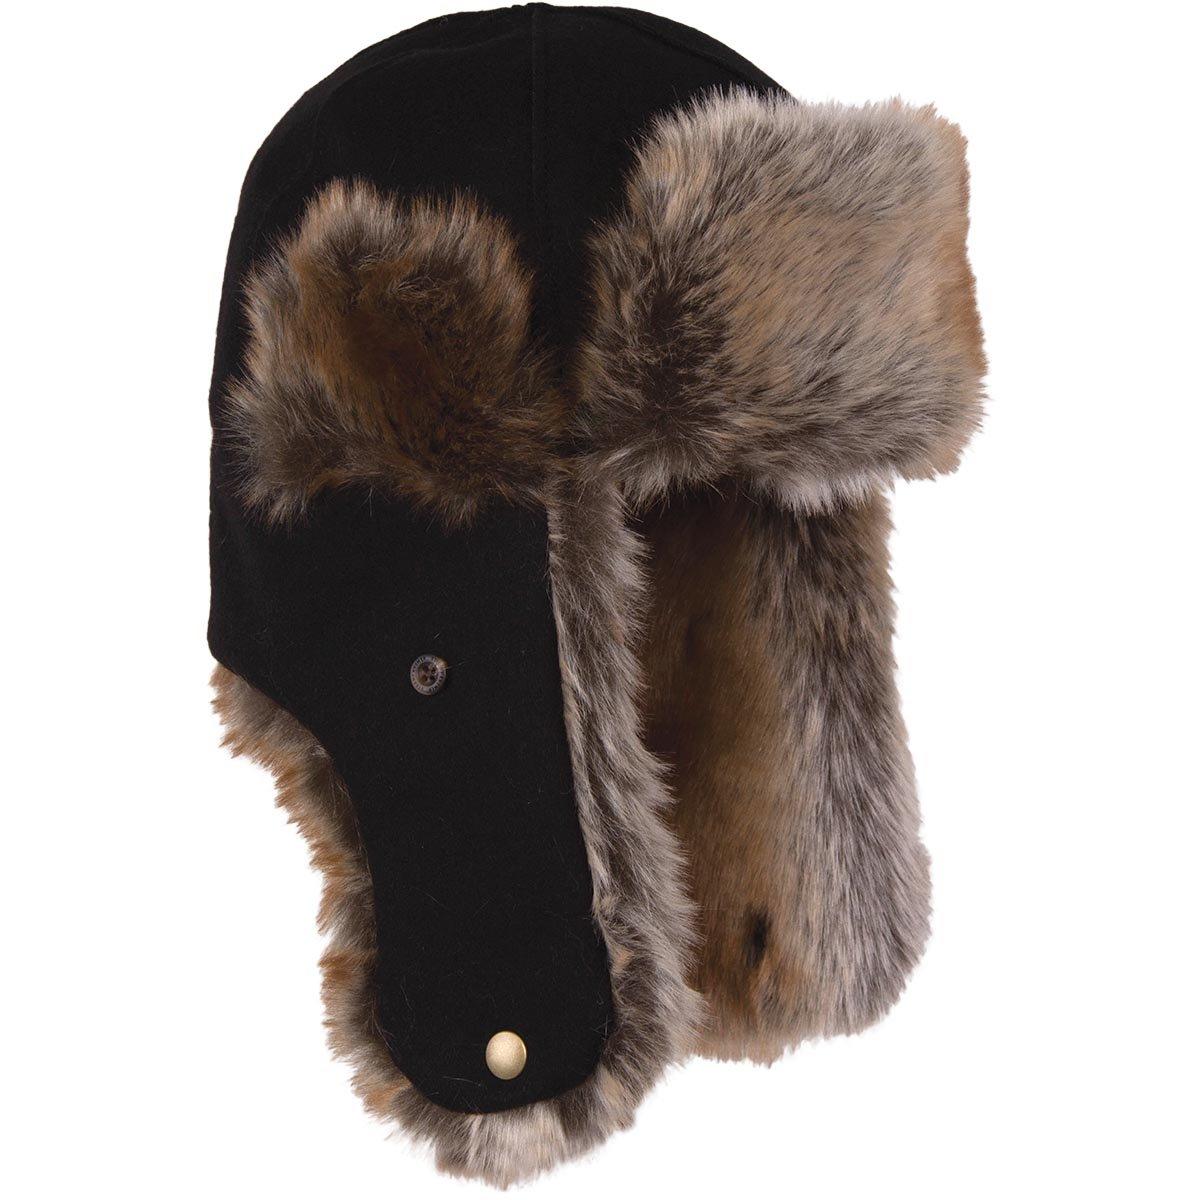 Stormy Kromer The Northwoods Trapper Hat, Color: Black, Size: Lg (51210-000060-2